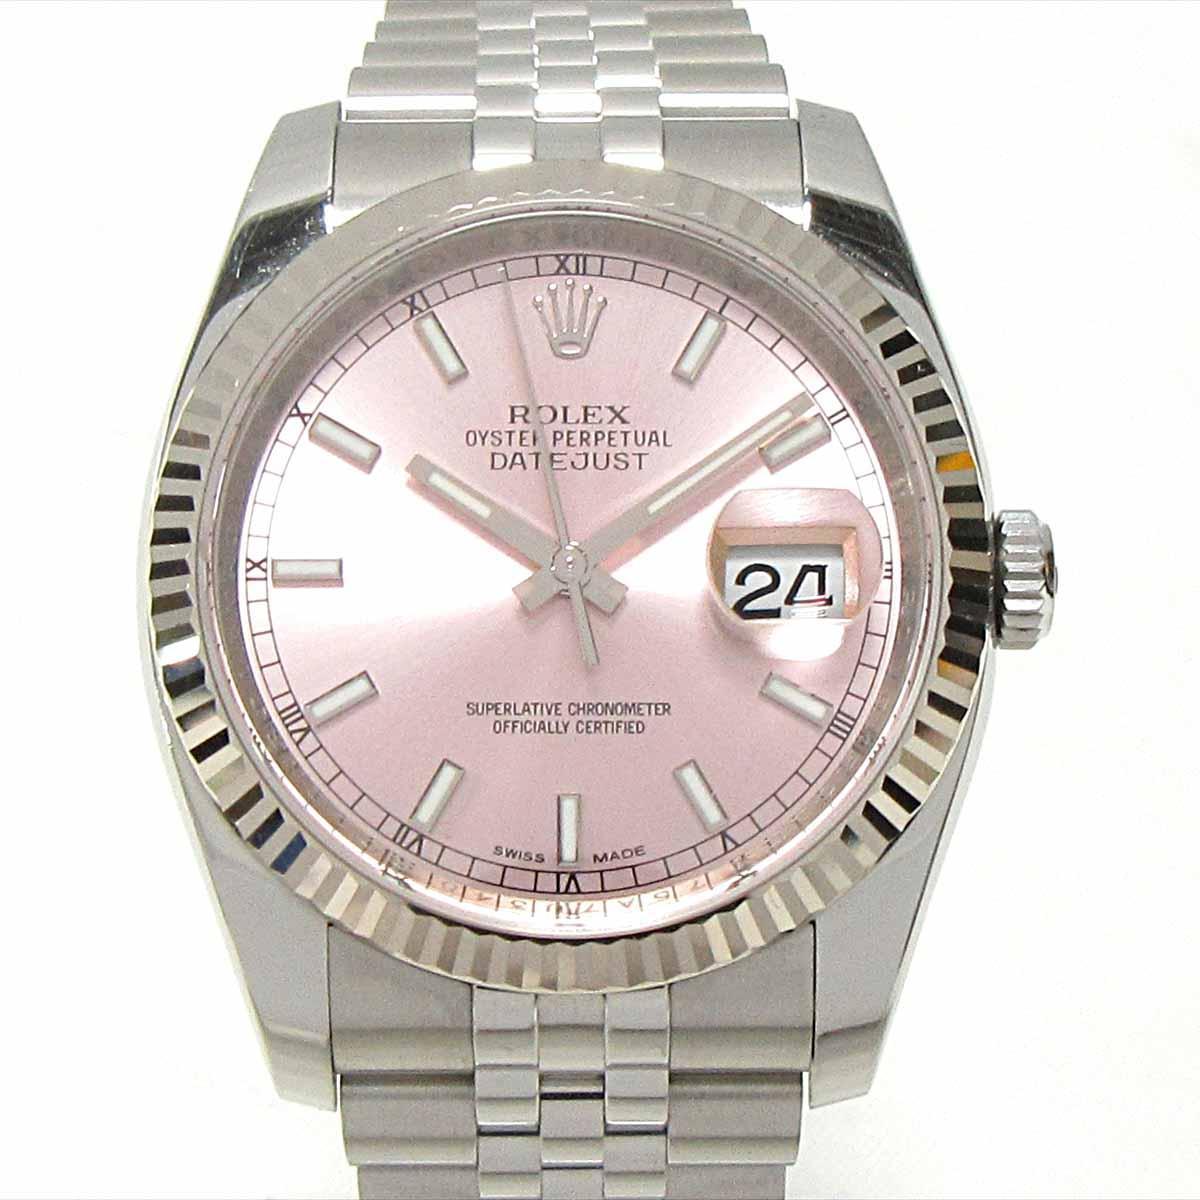 ROLEX 時計 116234 デイトジャスト 腕時計/メンズ/お洒落